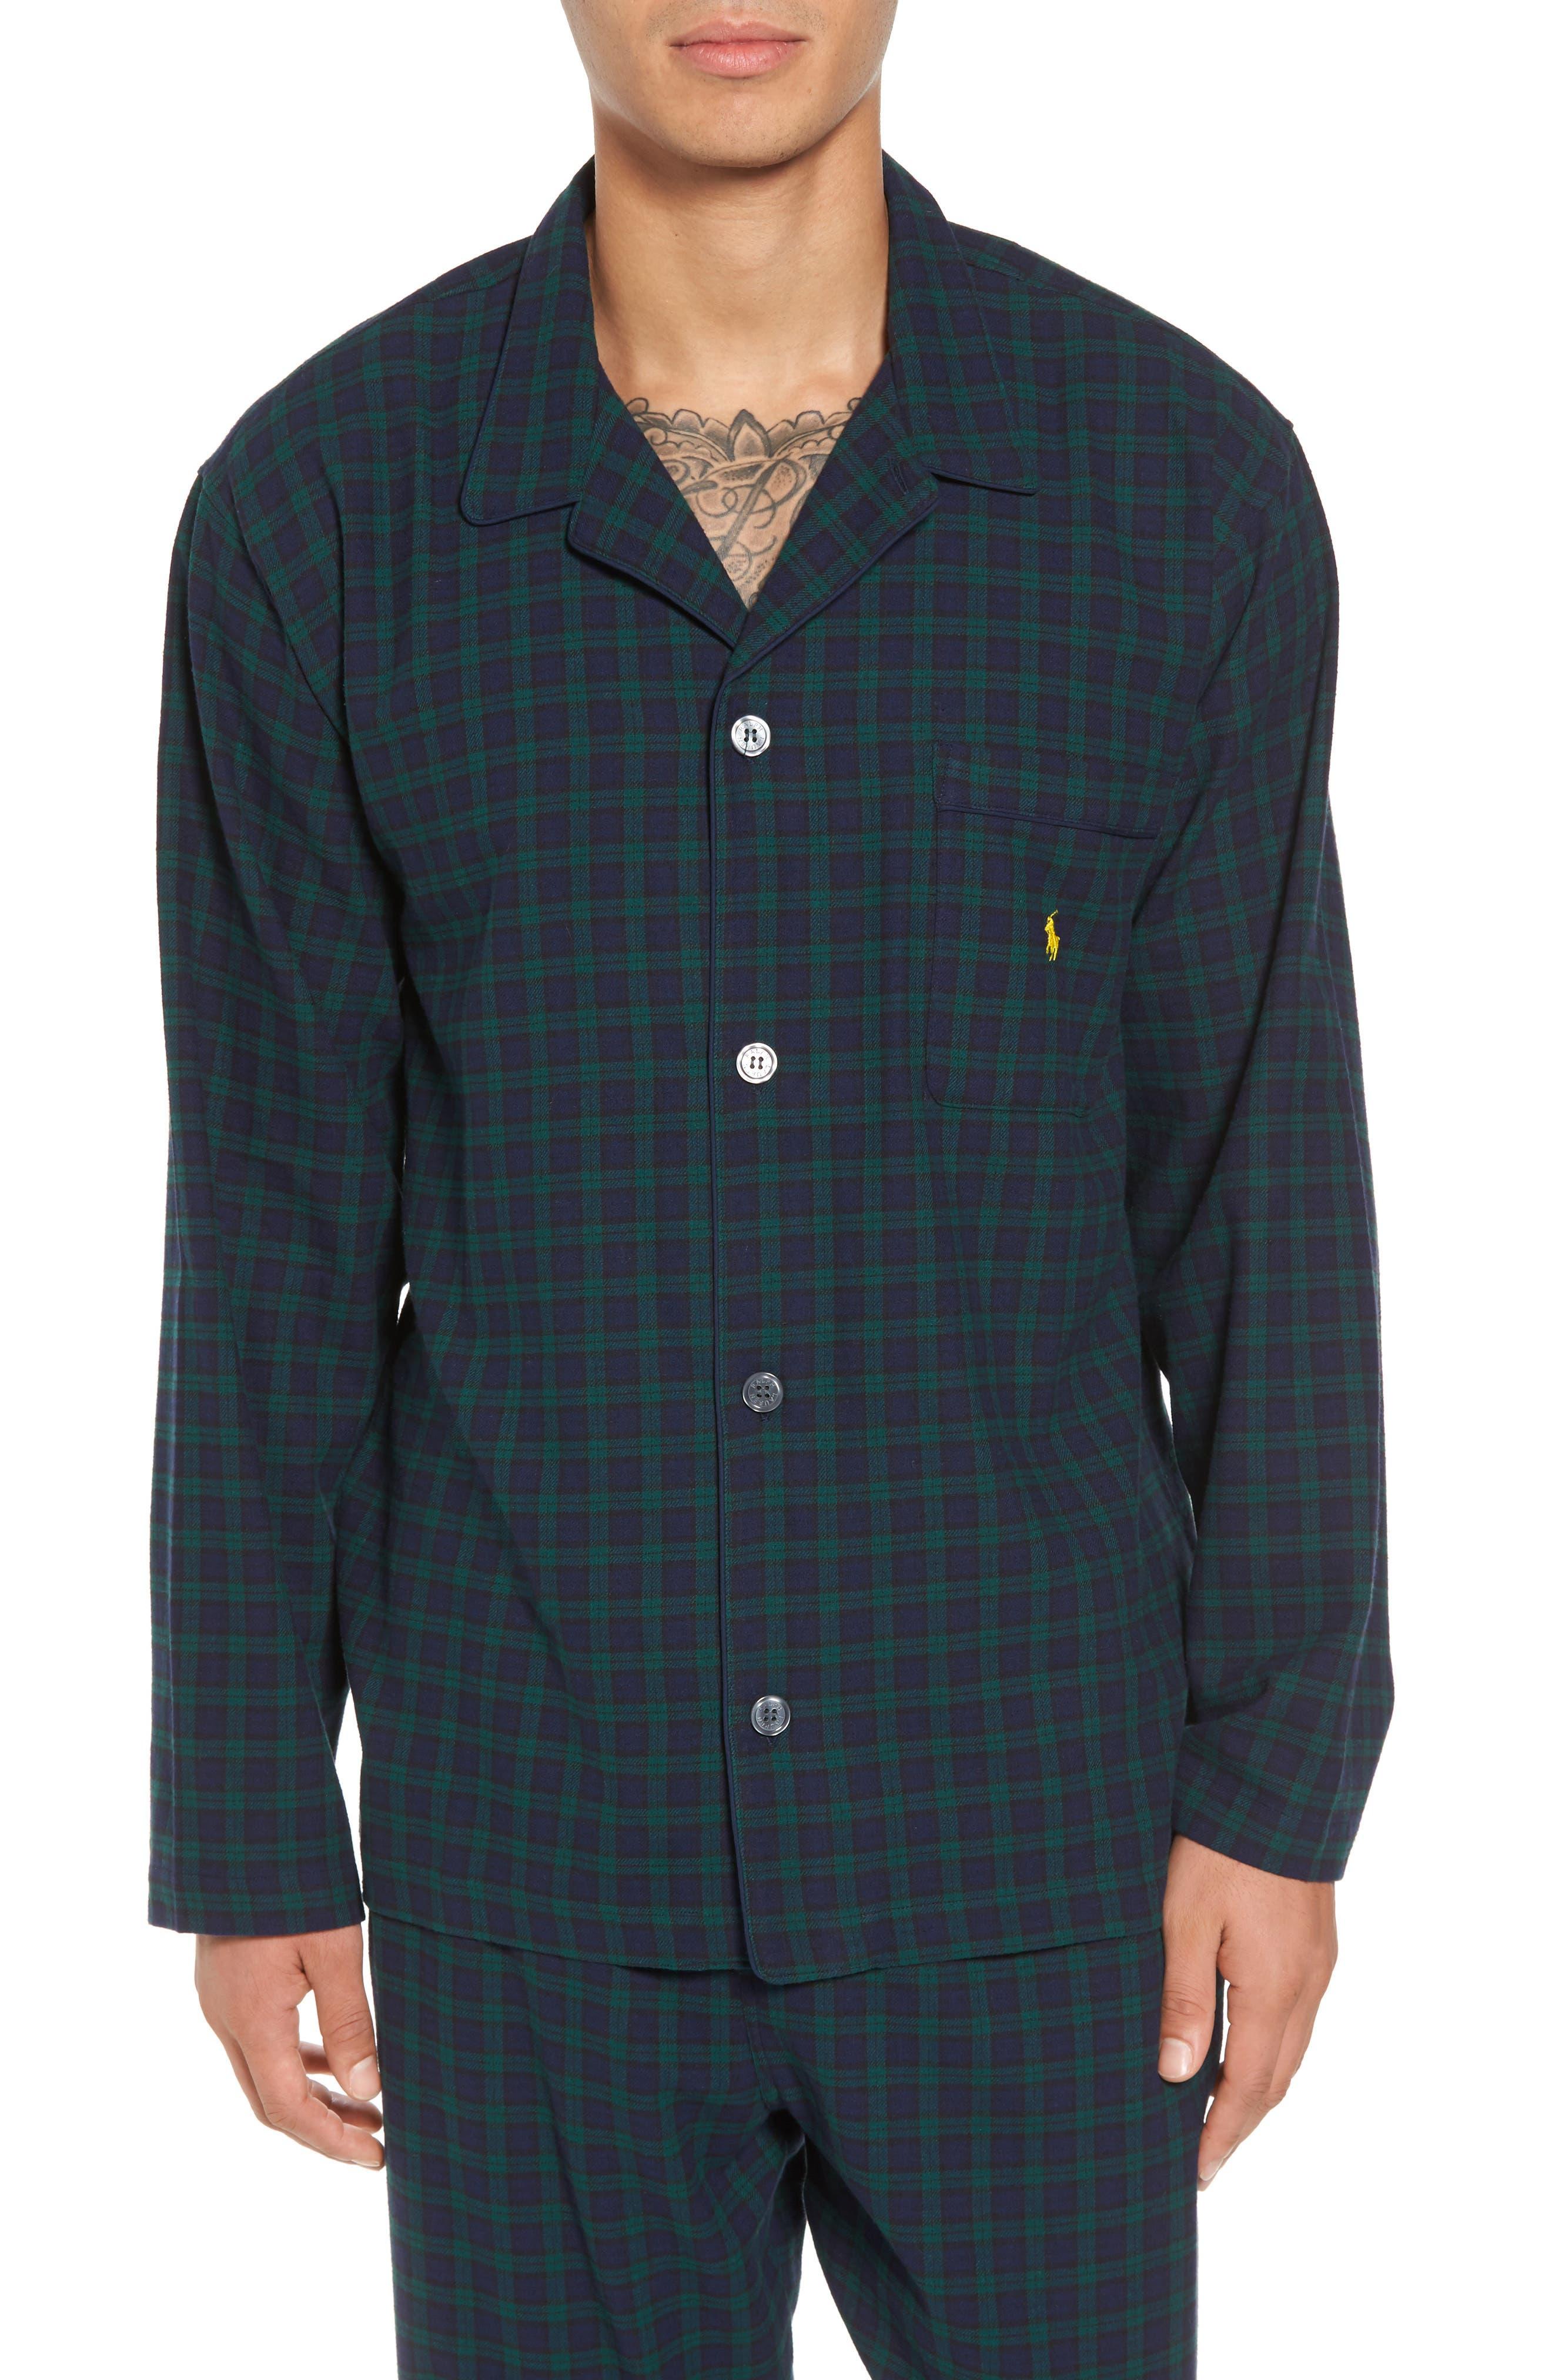 Alternate Image 1 Selected - Polo Ralph Lauren Flannel Pajama Shirt